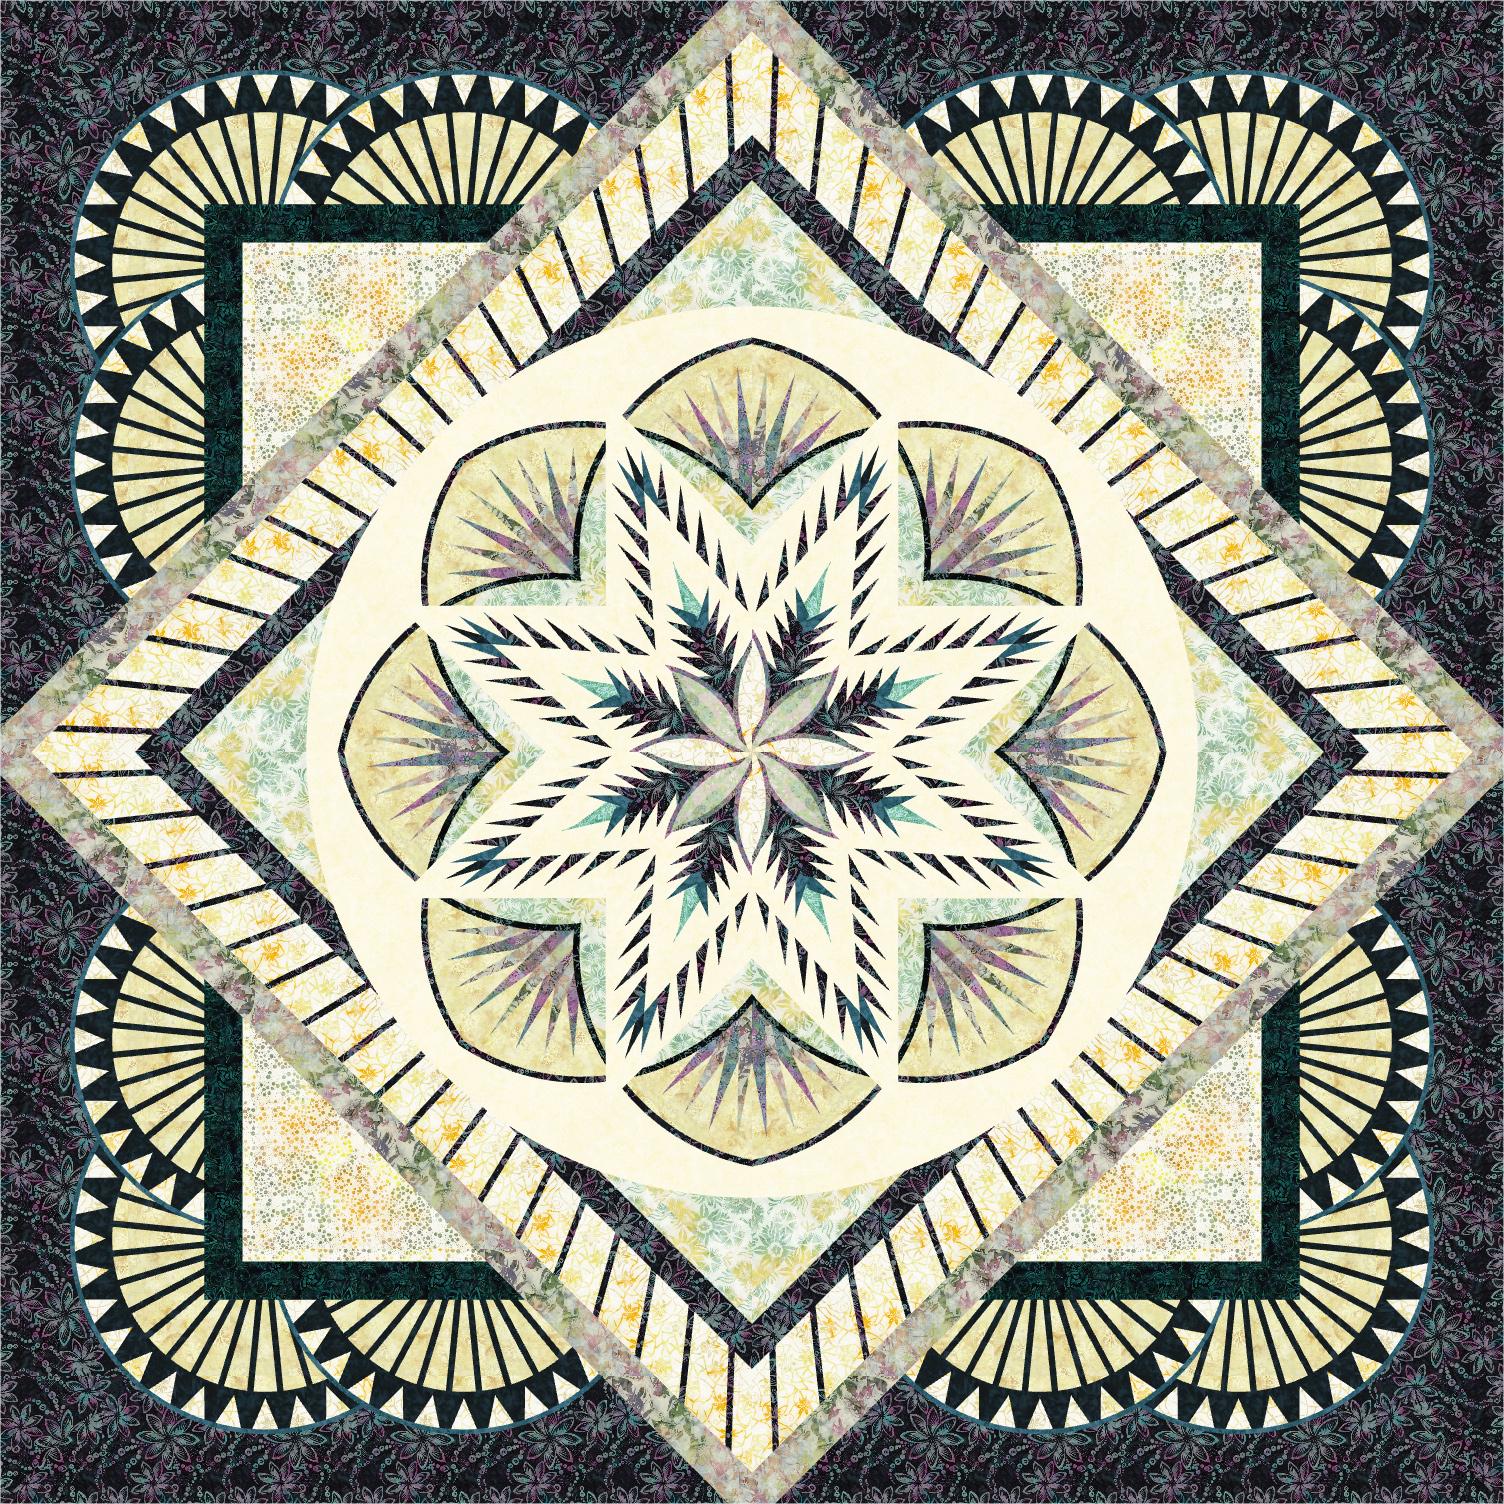 Honeycomb 116x116